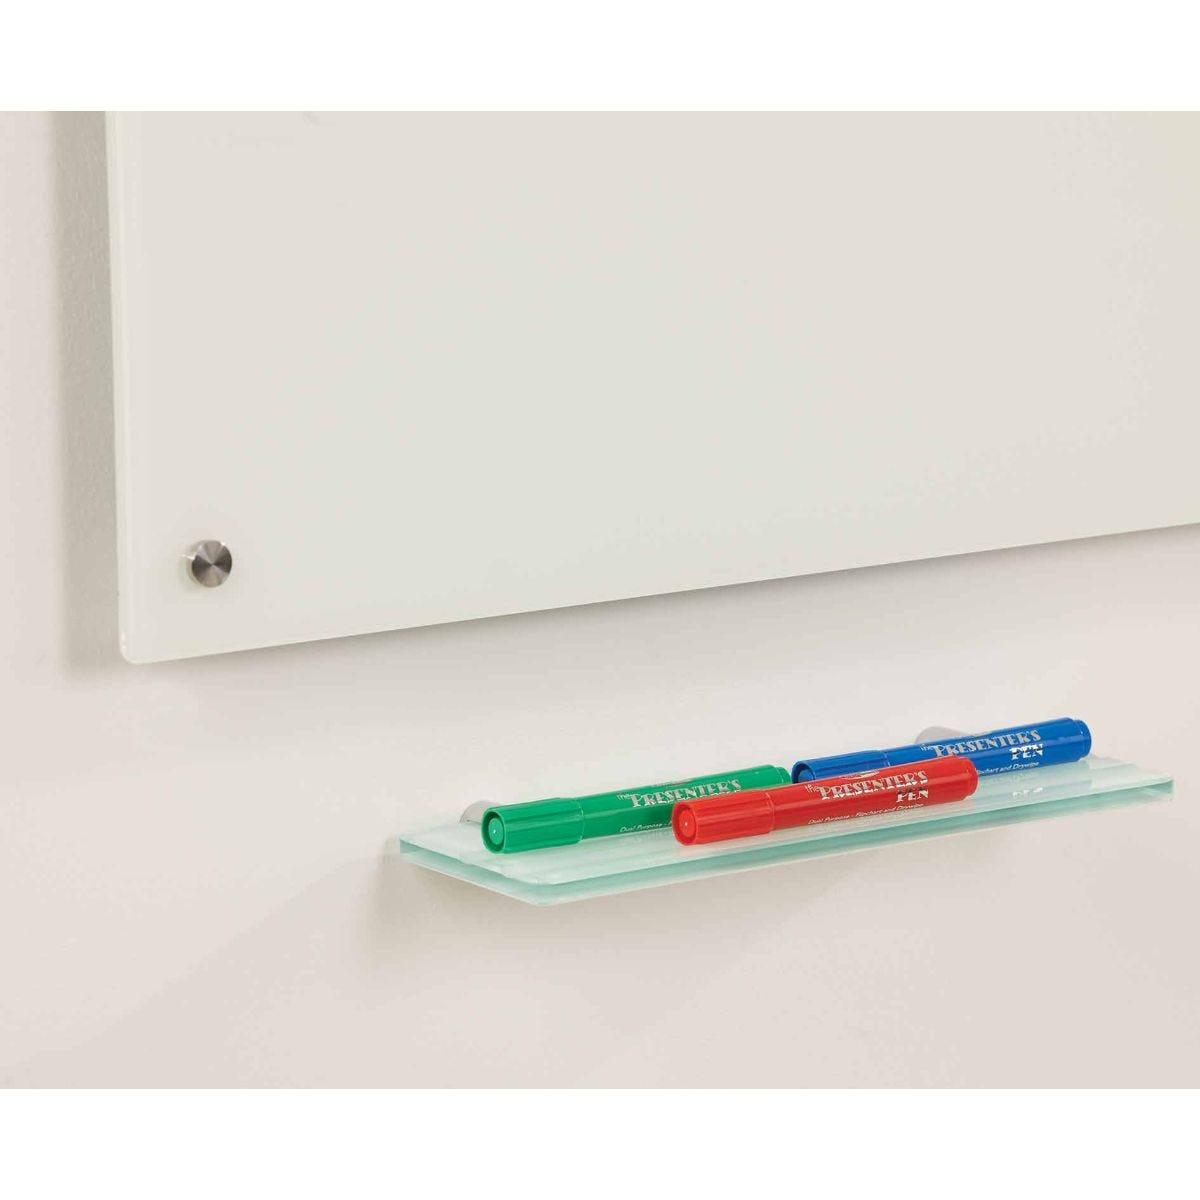 metroplan writeon glass pen tray, clear